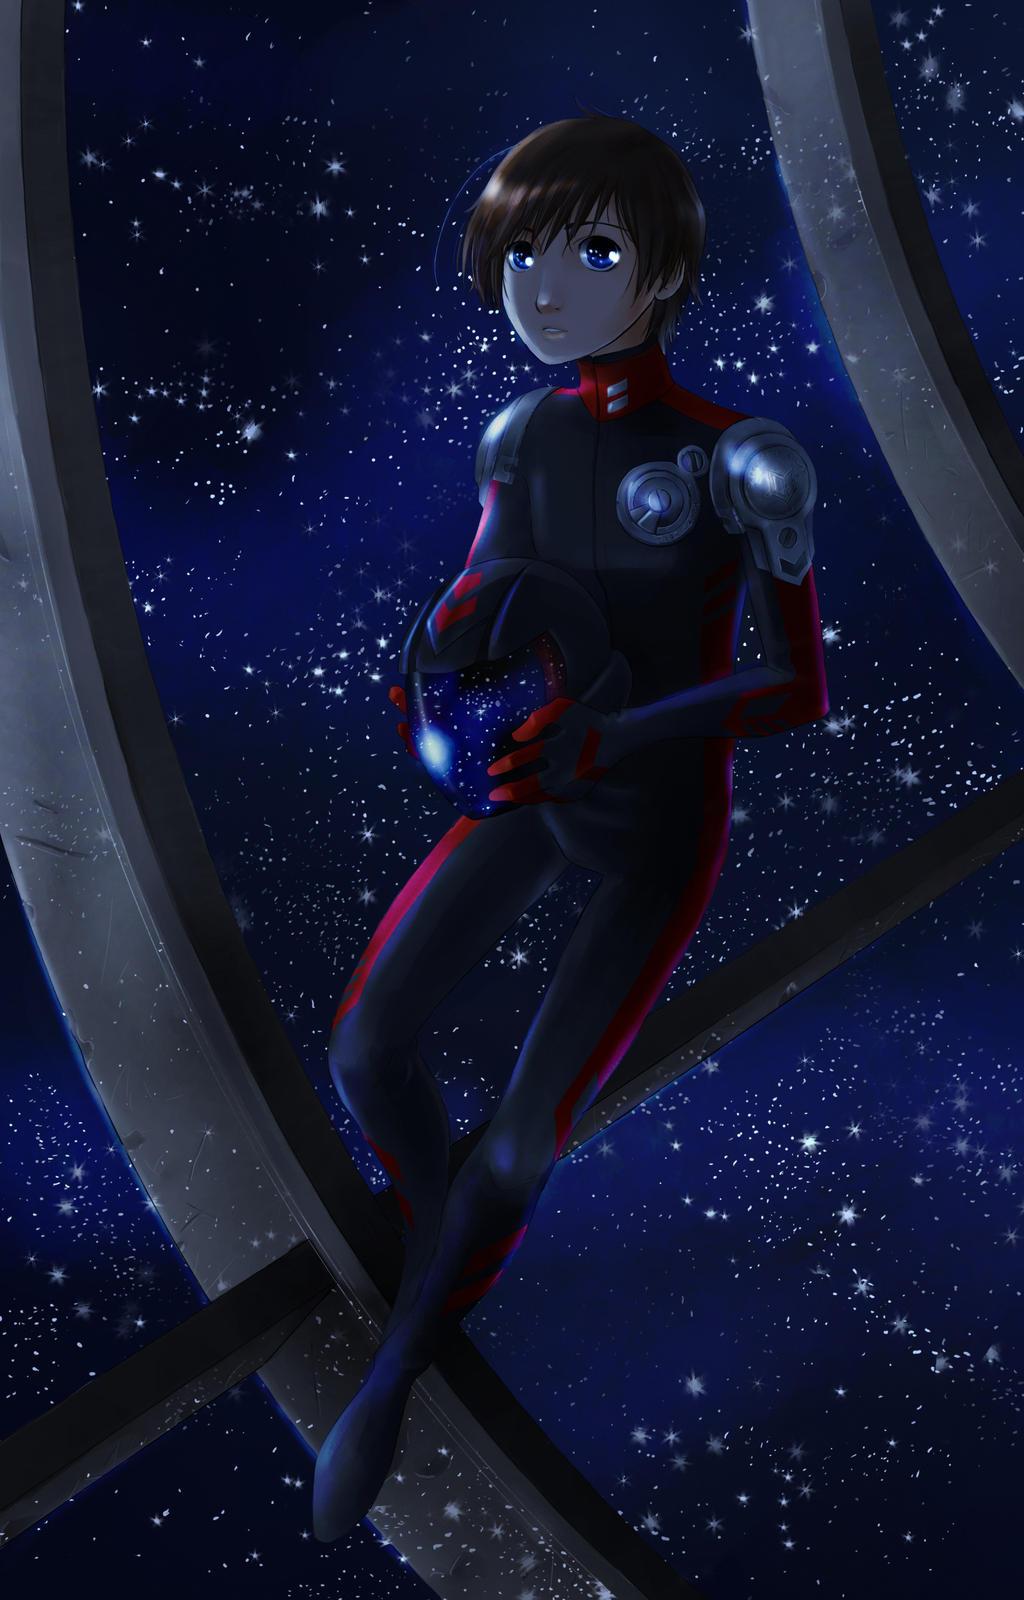 ConceptArt-Spacesuit by redfrog2b on DeviantArt